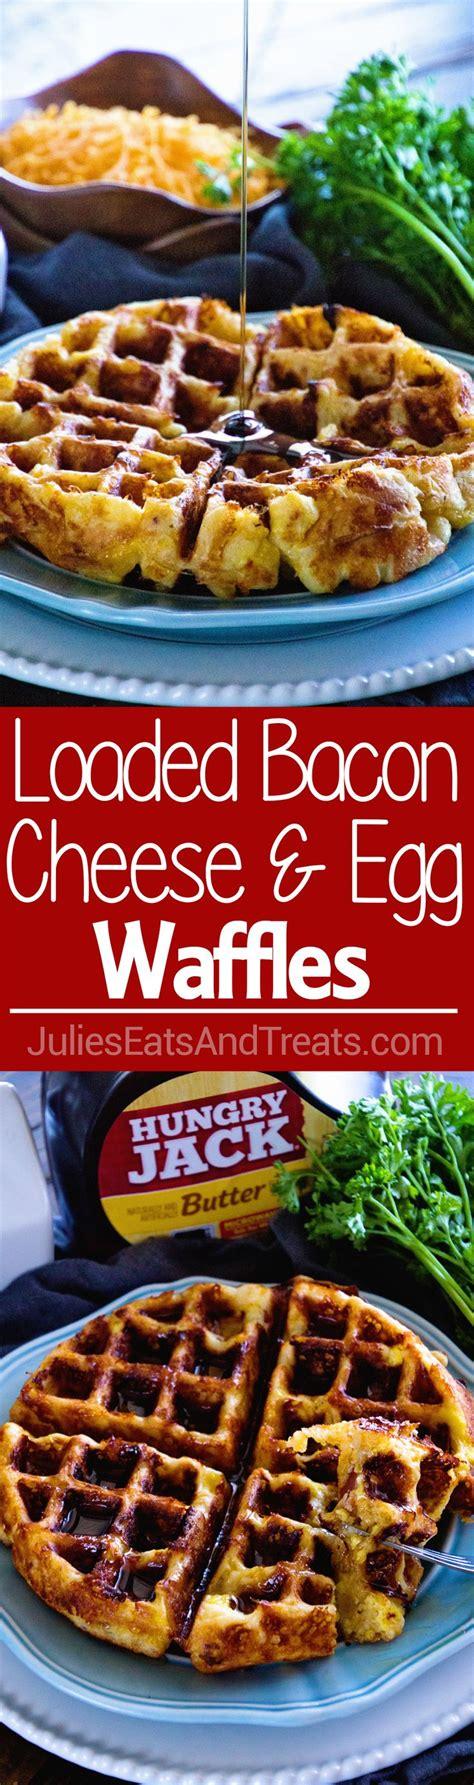 waffle house waffle recipe 1000 ideas about waffle house waffles on pinterest top